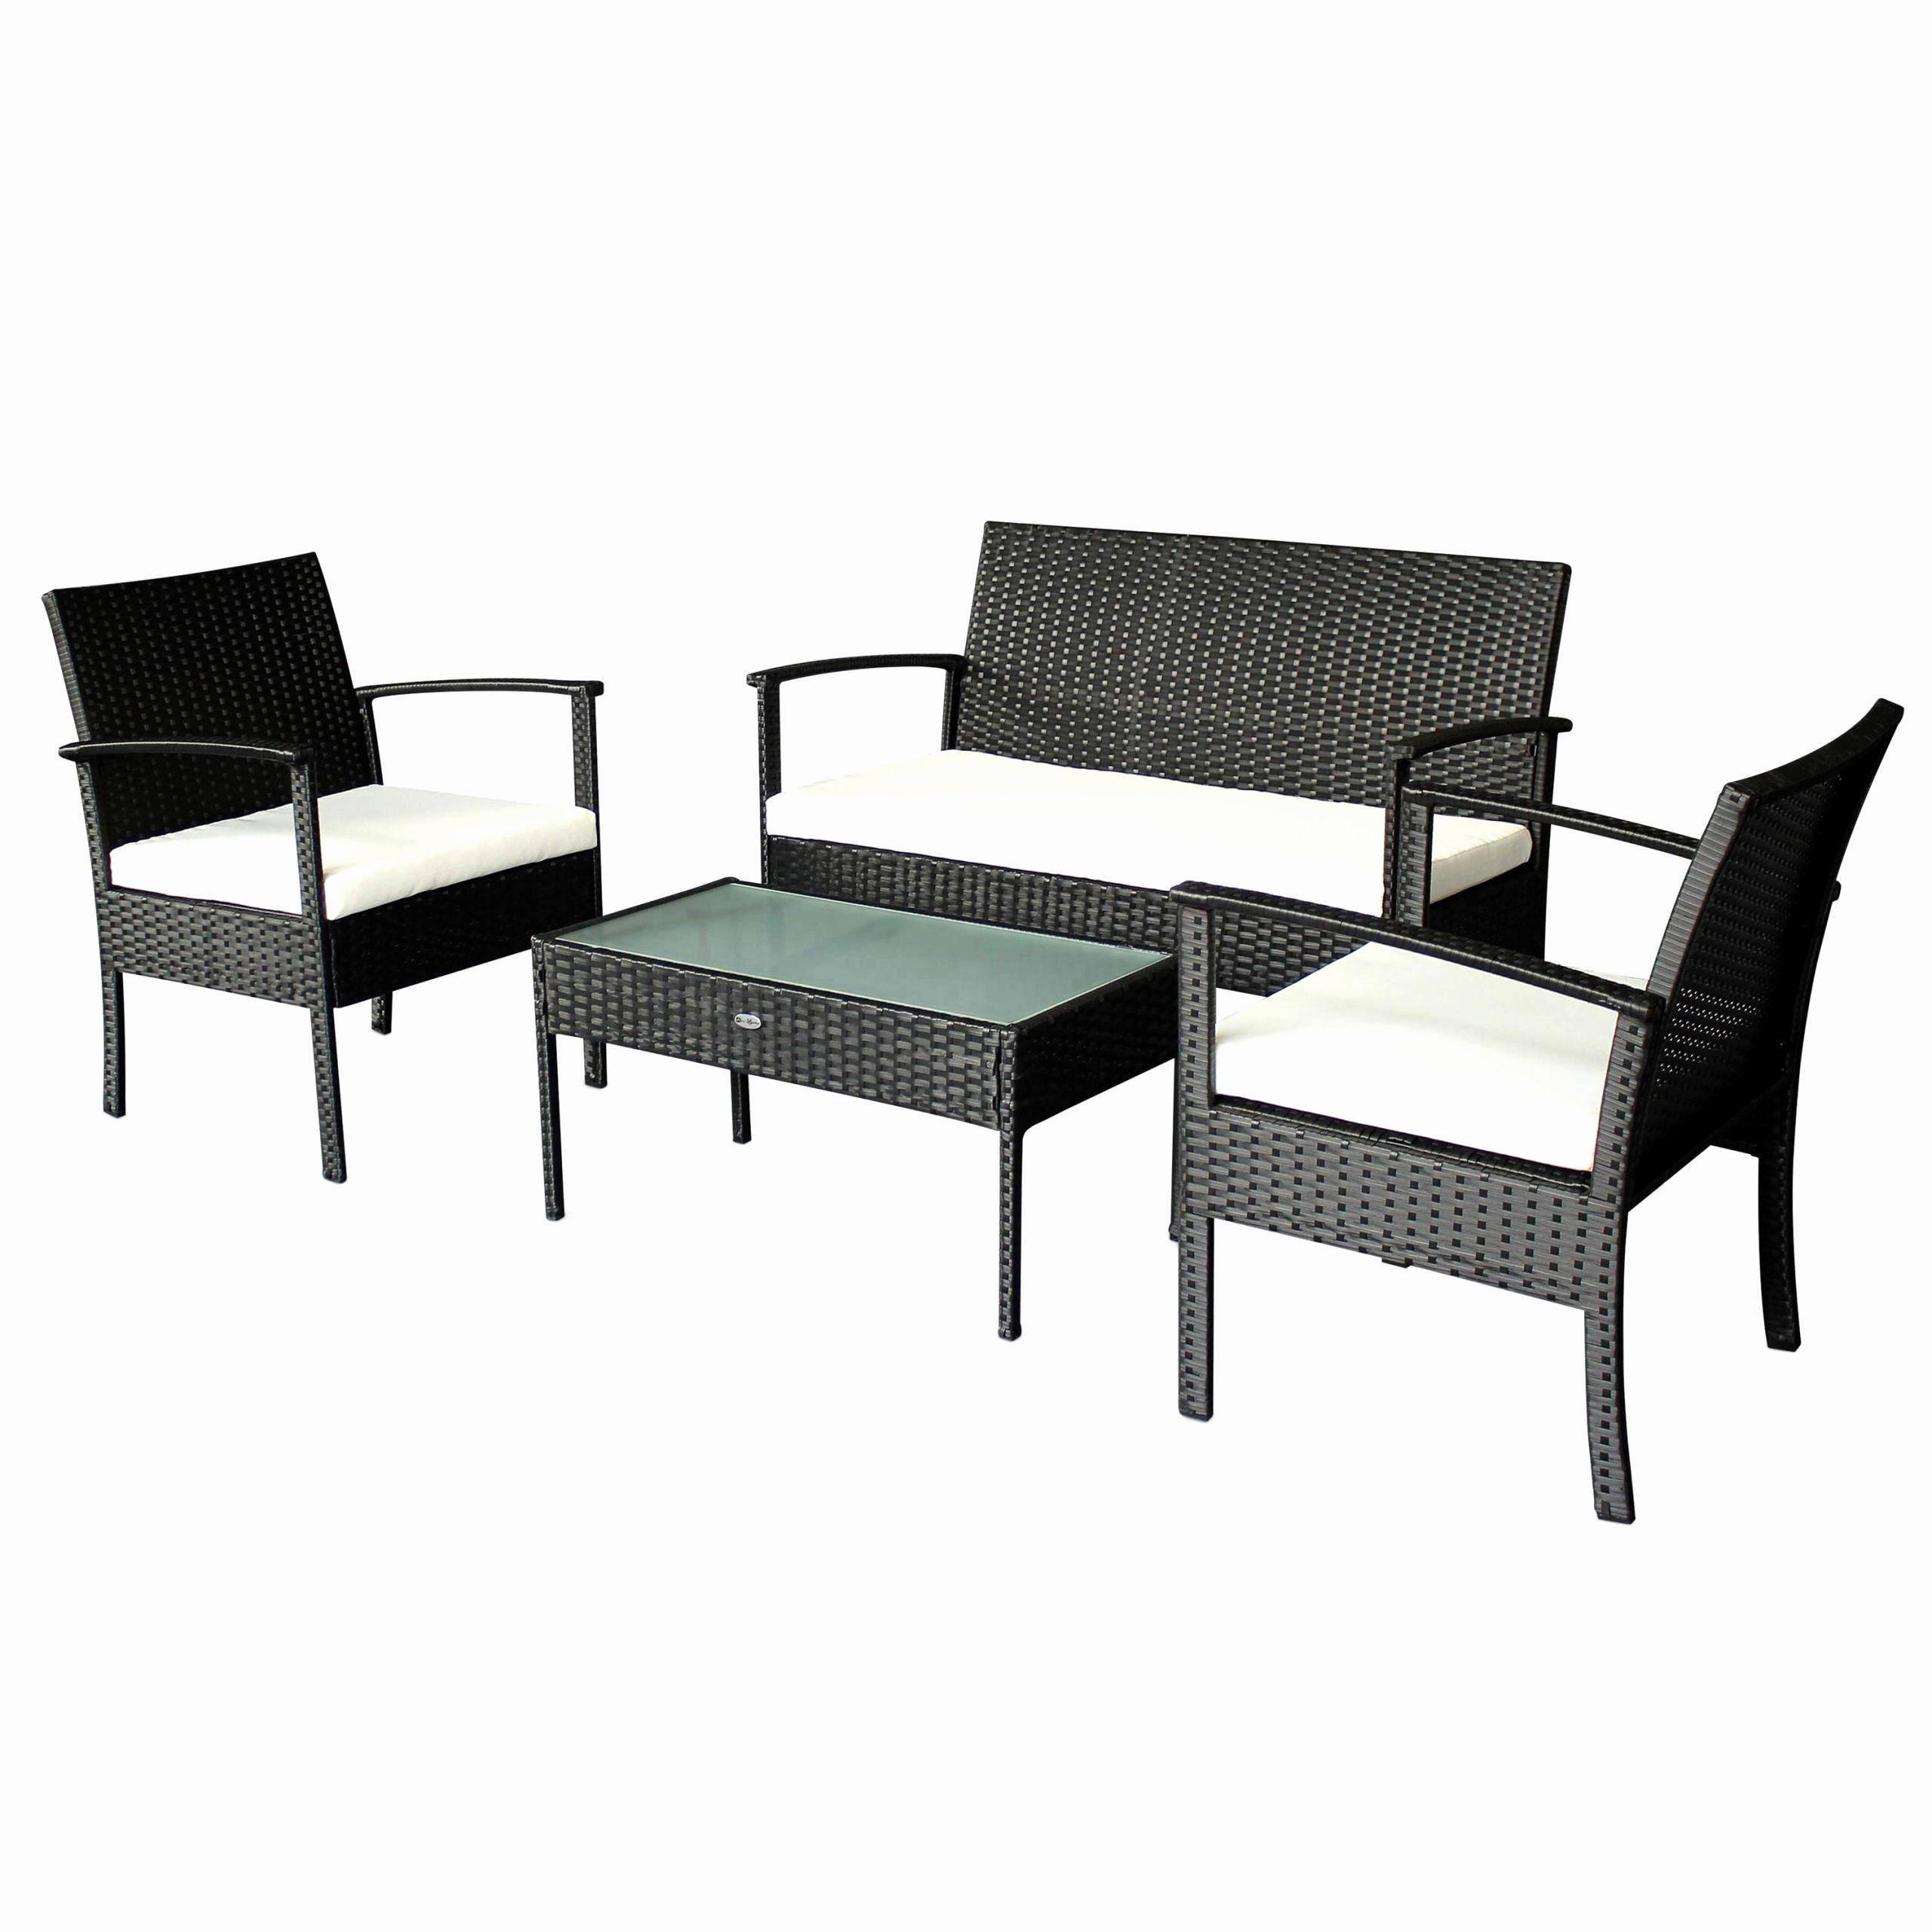 table pliante ronde unique table chaise jardin table ronde pliable table et chaise design of table pliante ronde